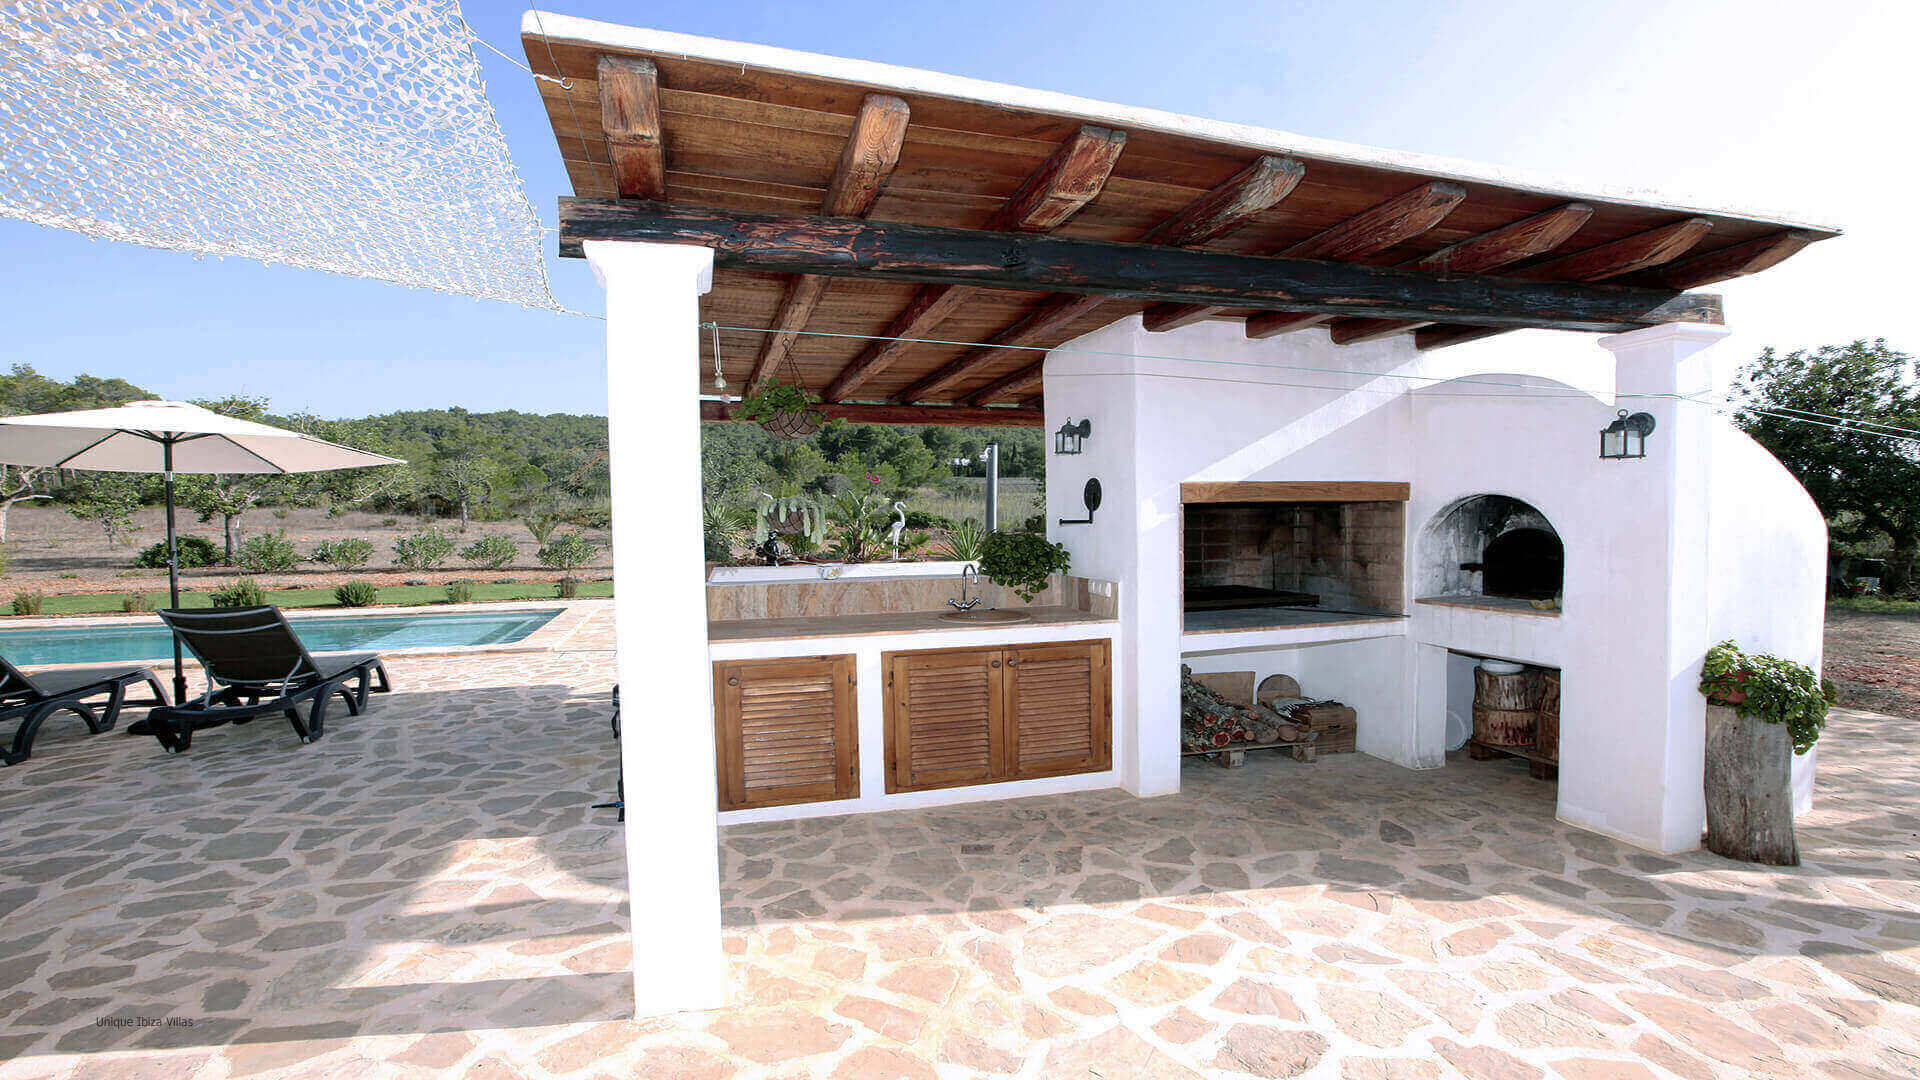 Cana Marieta Ibiza Villa 7 Near San Miguel